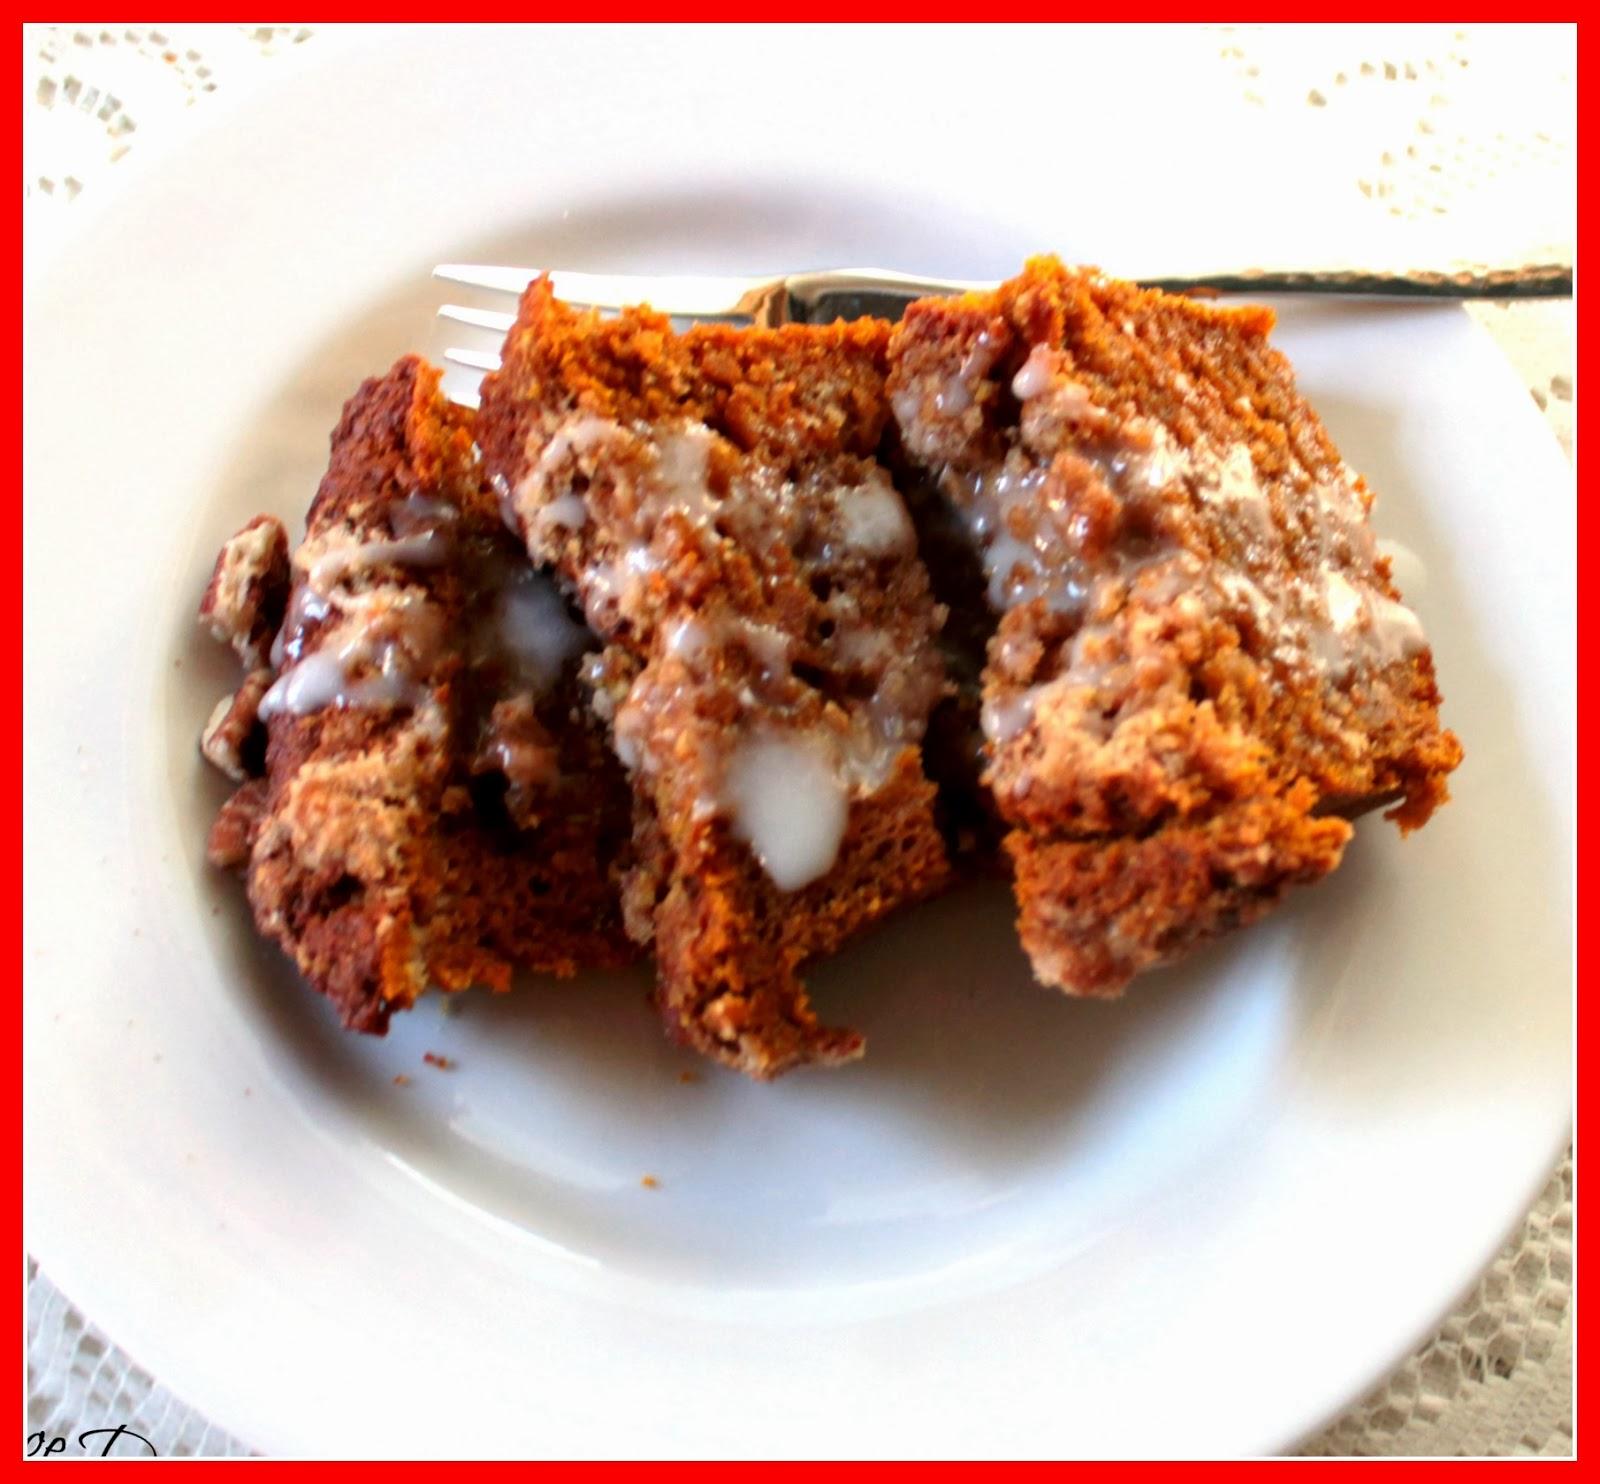 ... Smiles: Pumpkin Coffee Cake with Brown Sugar Pecan Streusel Topping